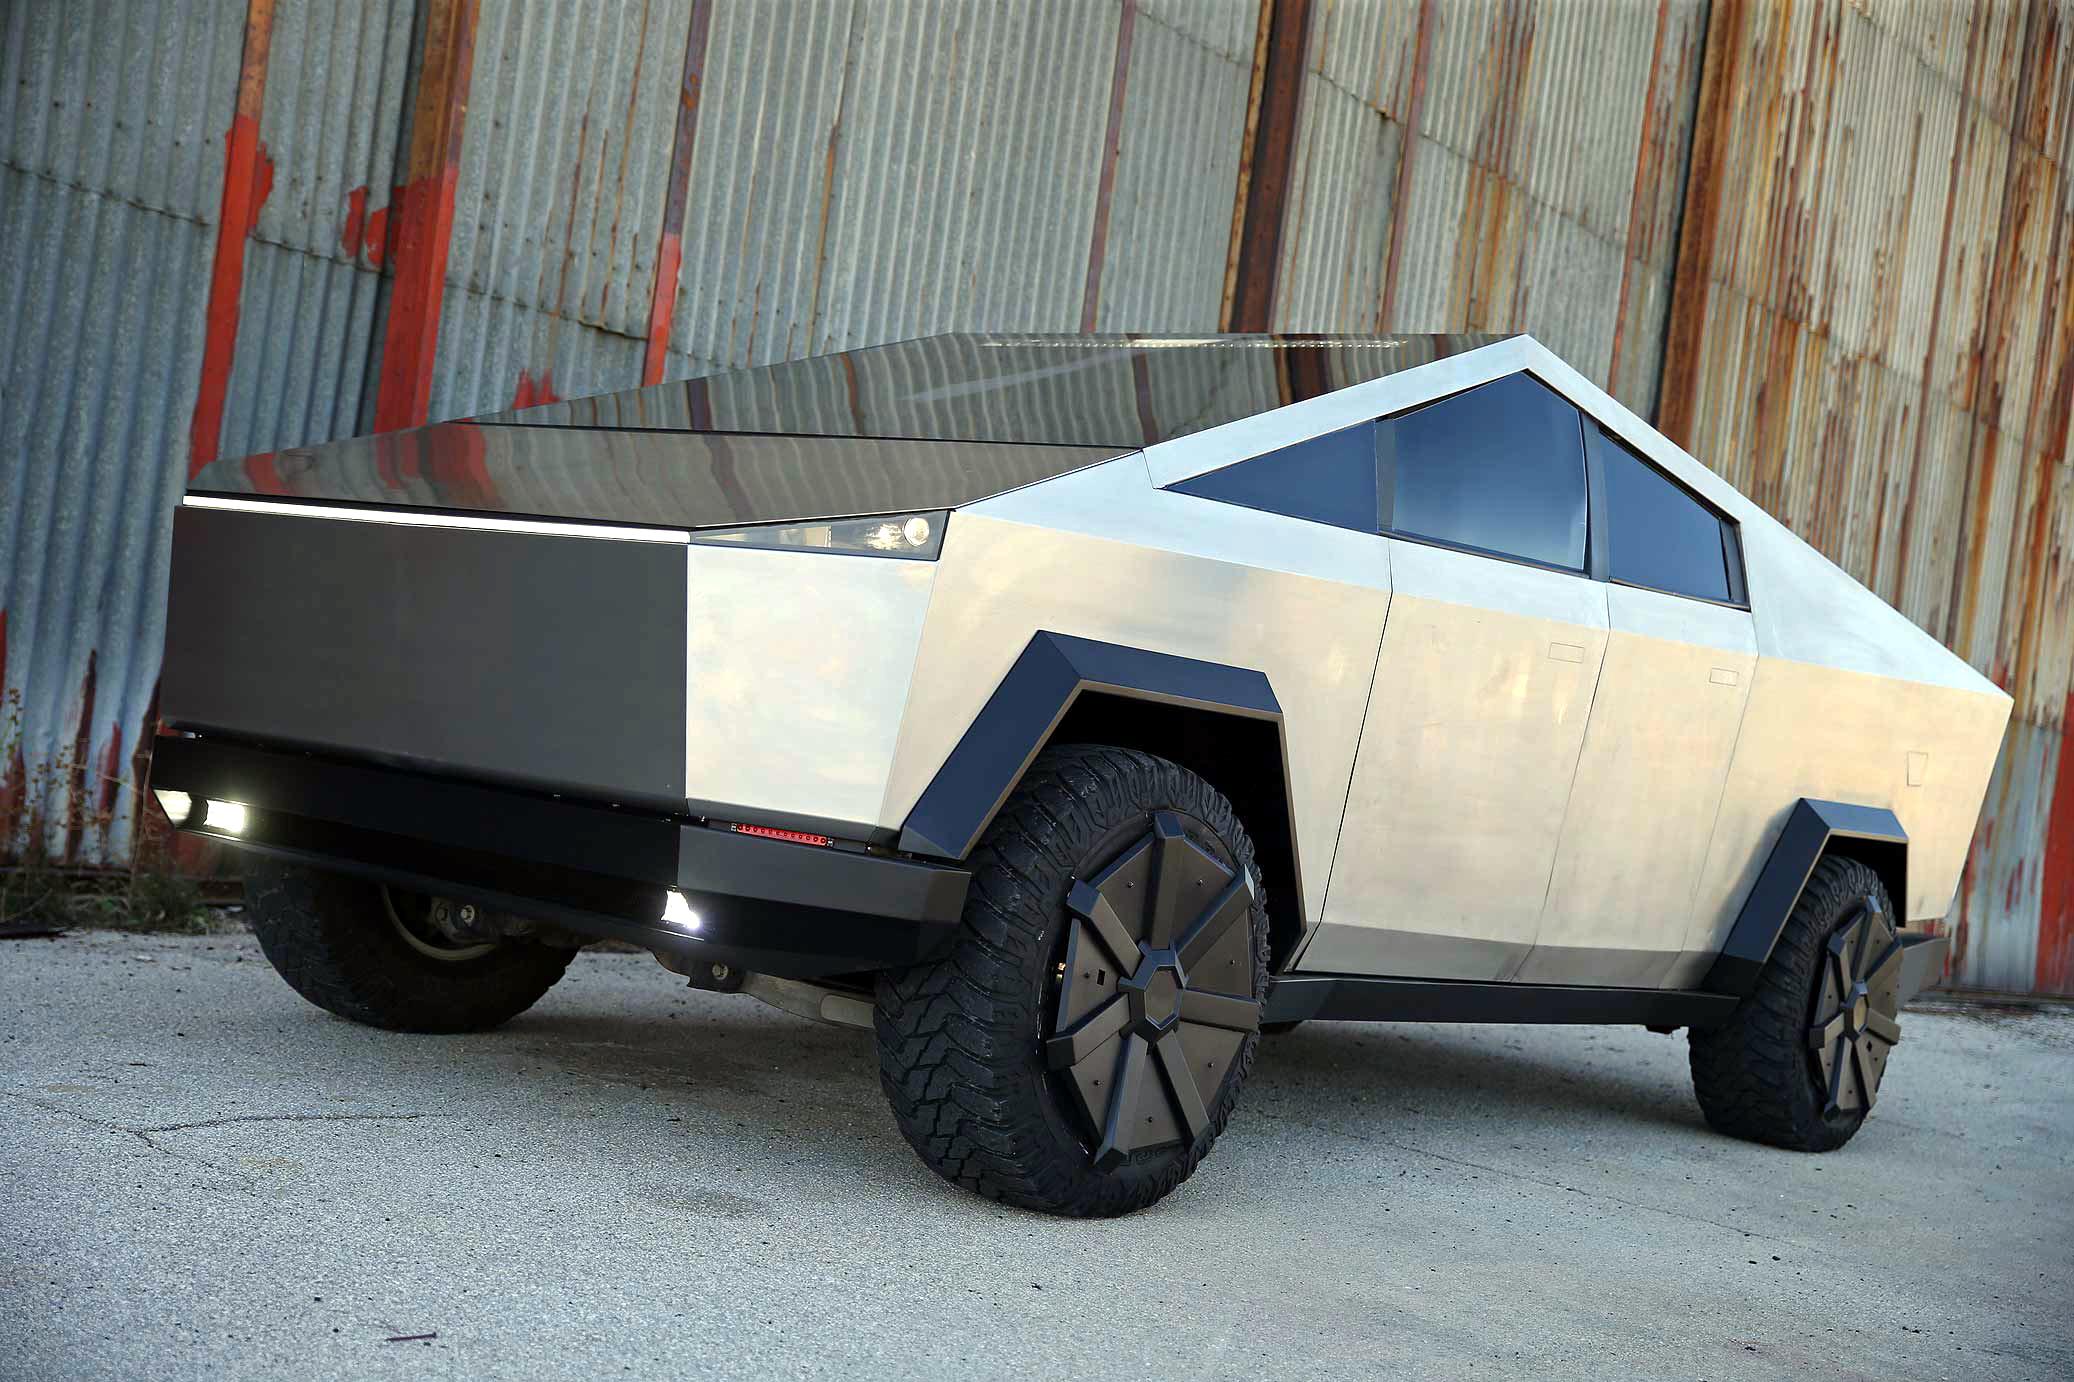 2021 Tesla Cybertruck Black Buy Life B Model Camper